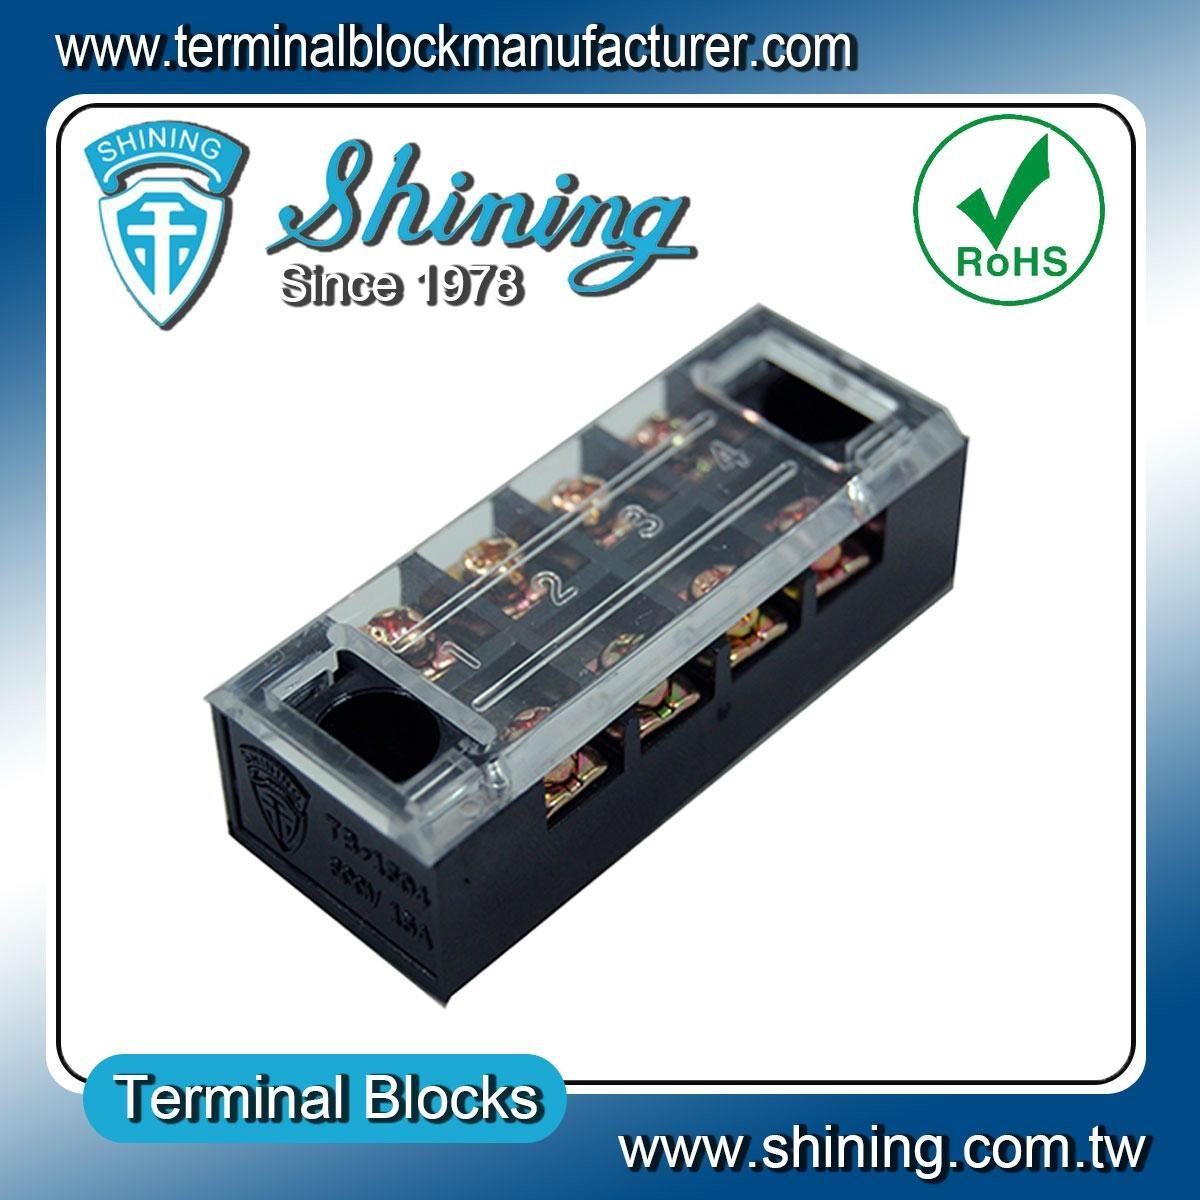 TB-2504L 固定式端子台 Fixed Terminal Block 1